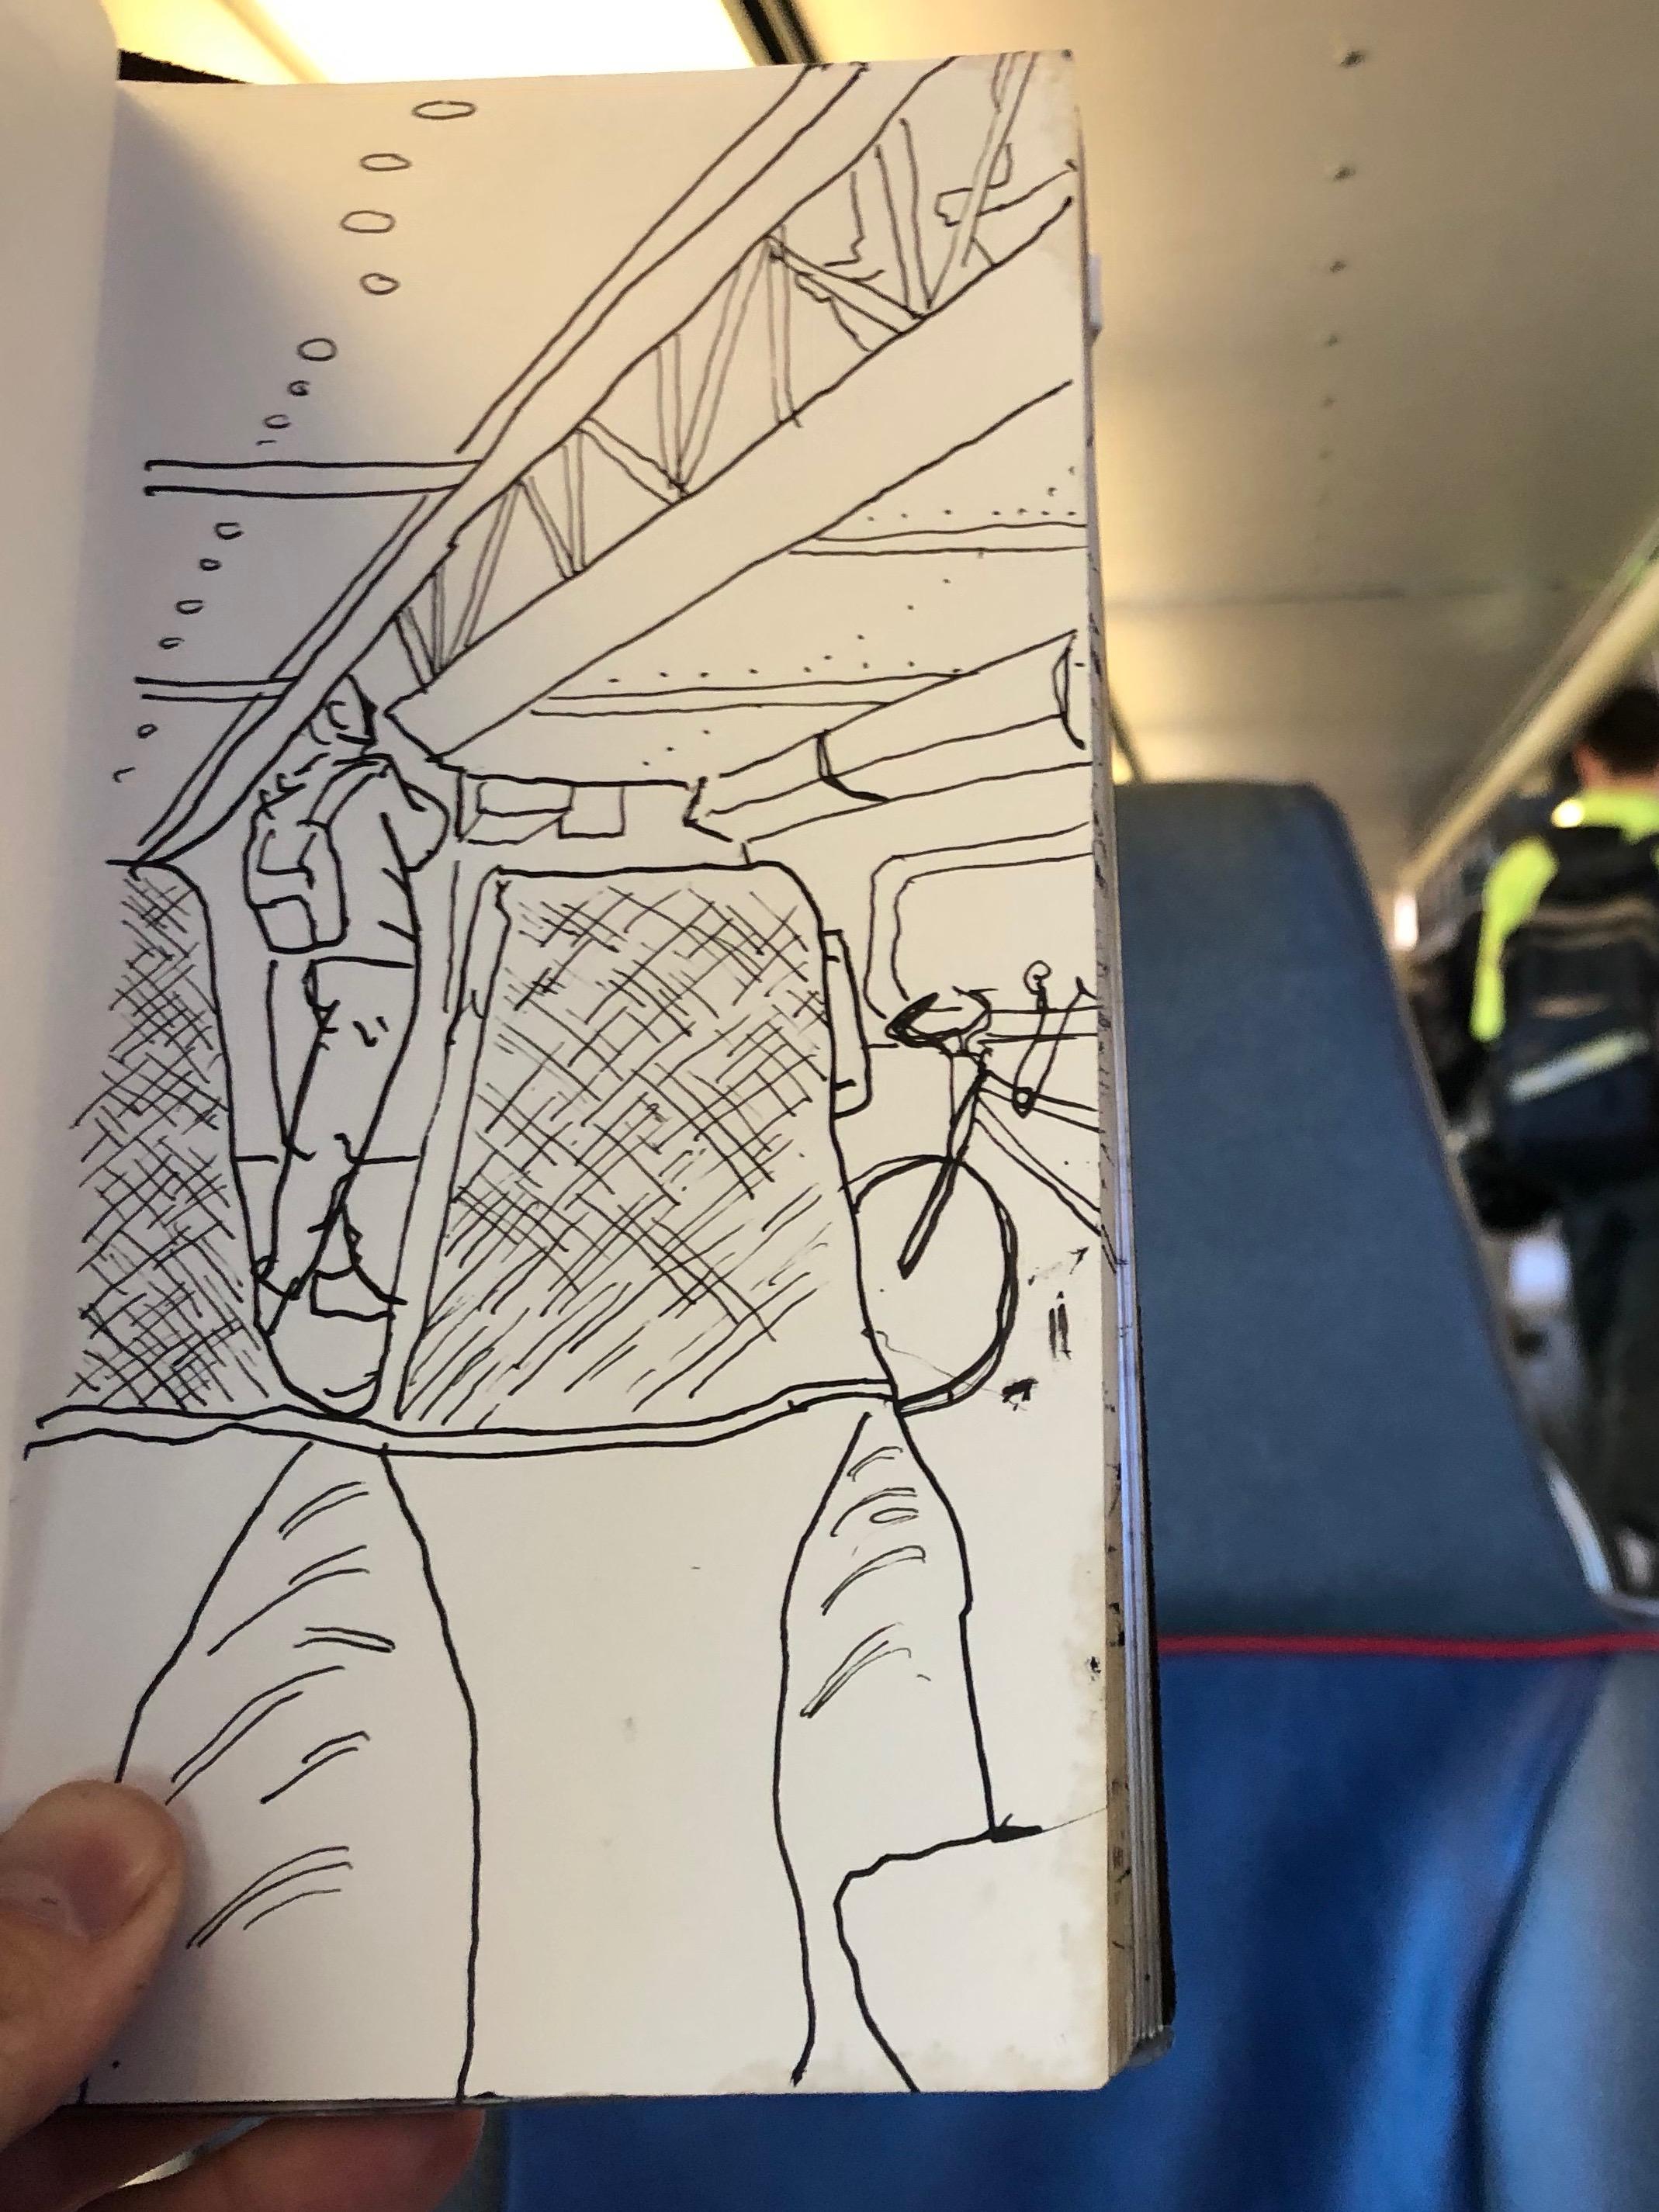 Inside the Caltrain Bike Car